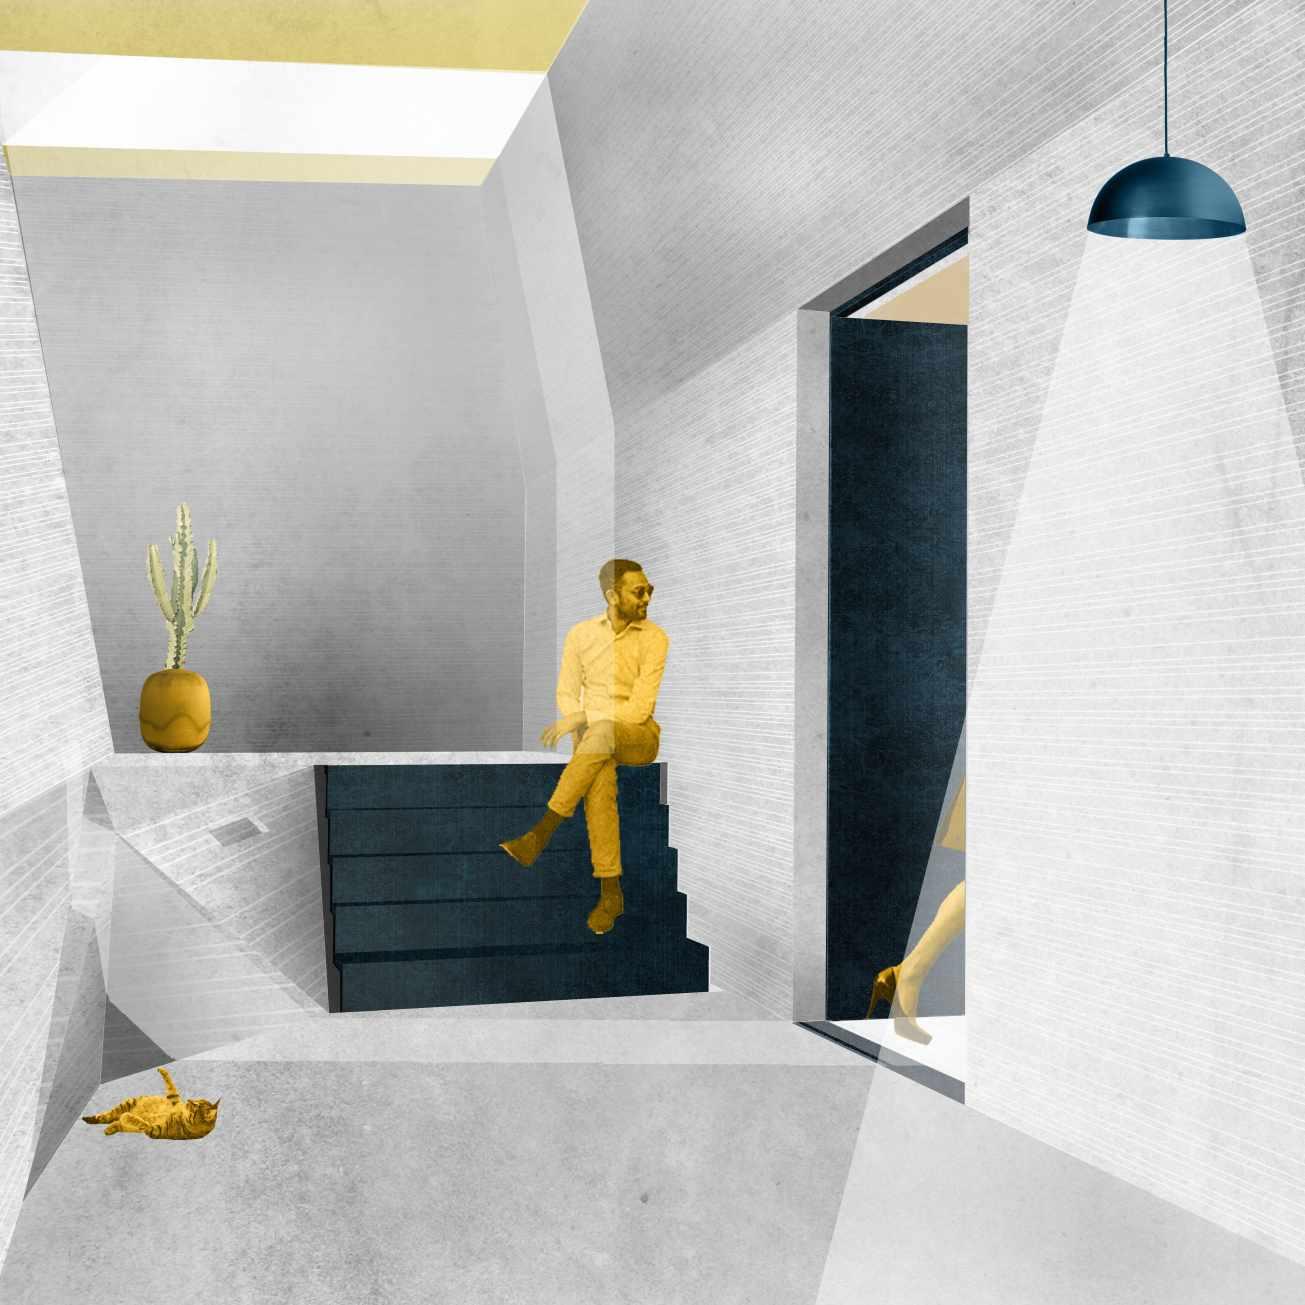 Dramatic daylight enters underground spaces, Evgenia Vlachaki, TUDelft MSc Architecture, Architecture and Public Building